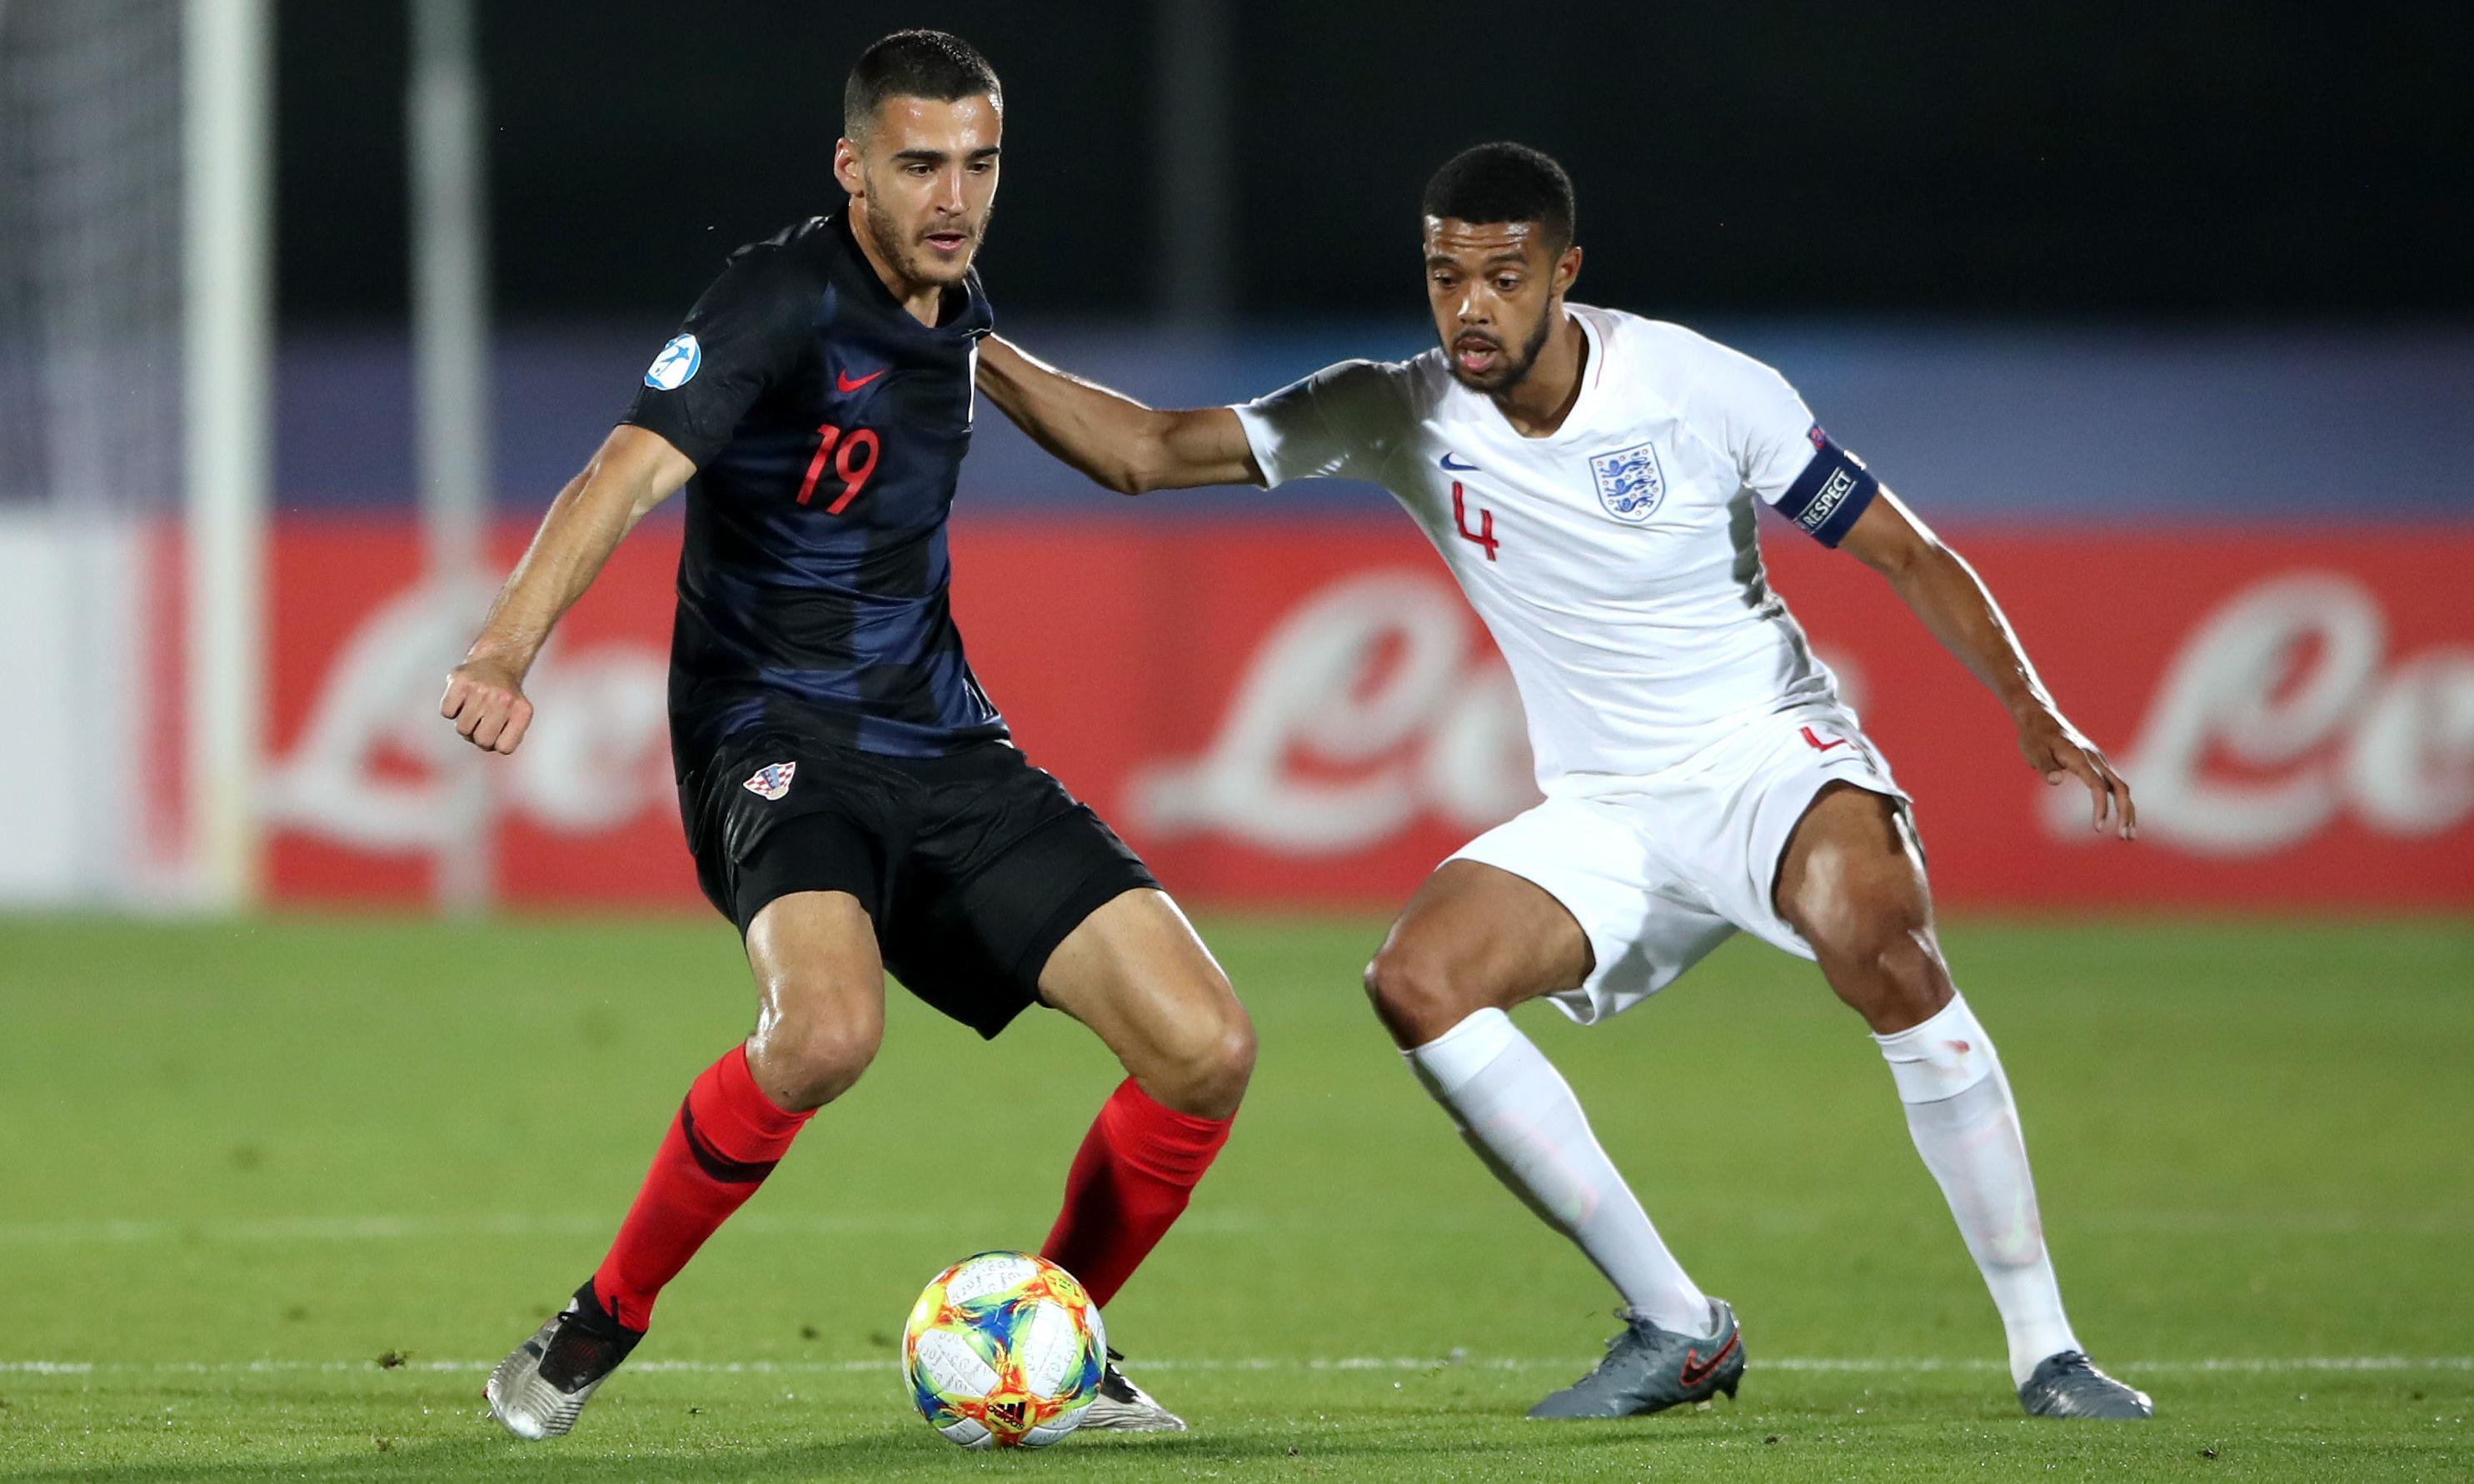 Brekalo's brace helps Croatia Under-21s haul England back three times